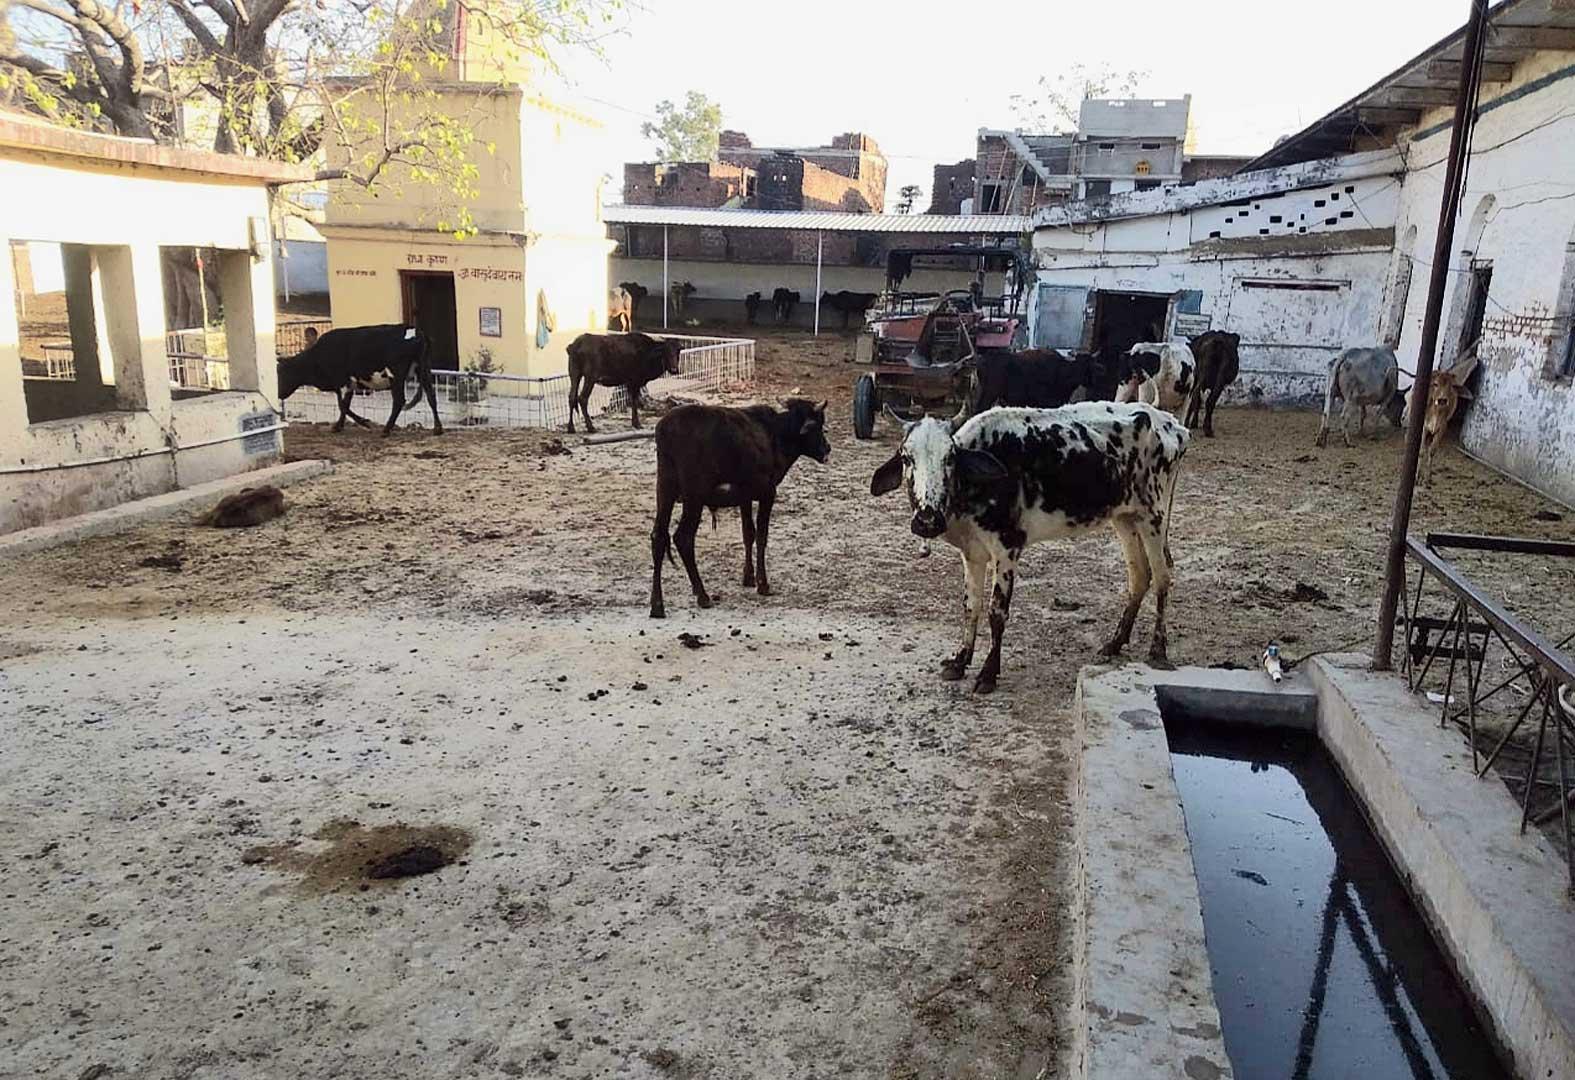 The Sri Krishna Goshala in Jehanabad where 17 cows died.